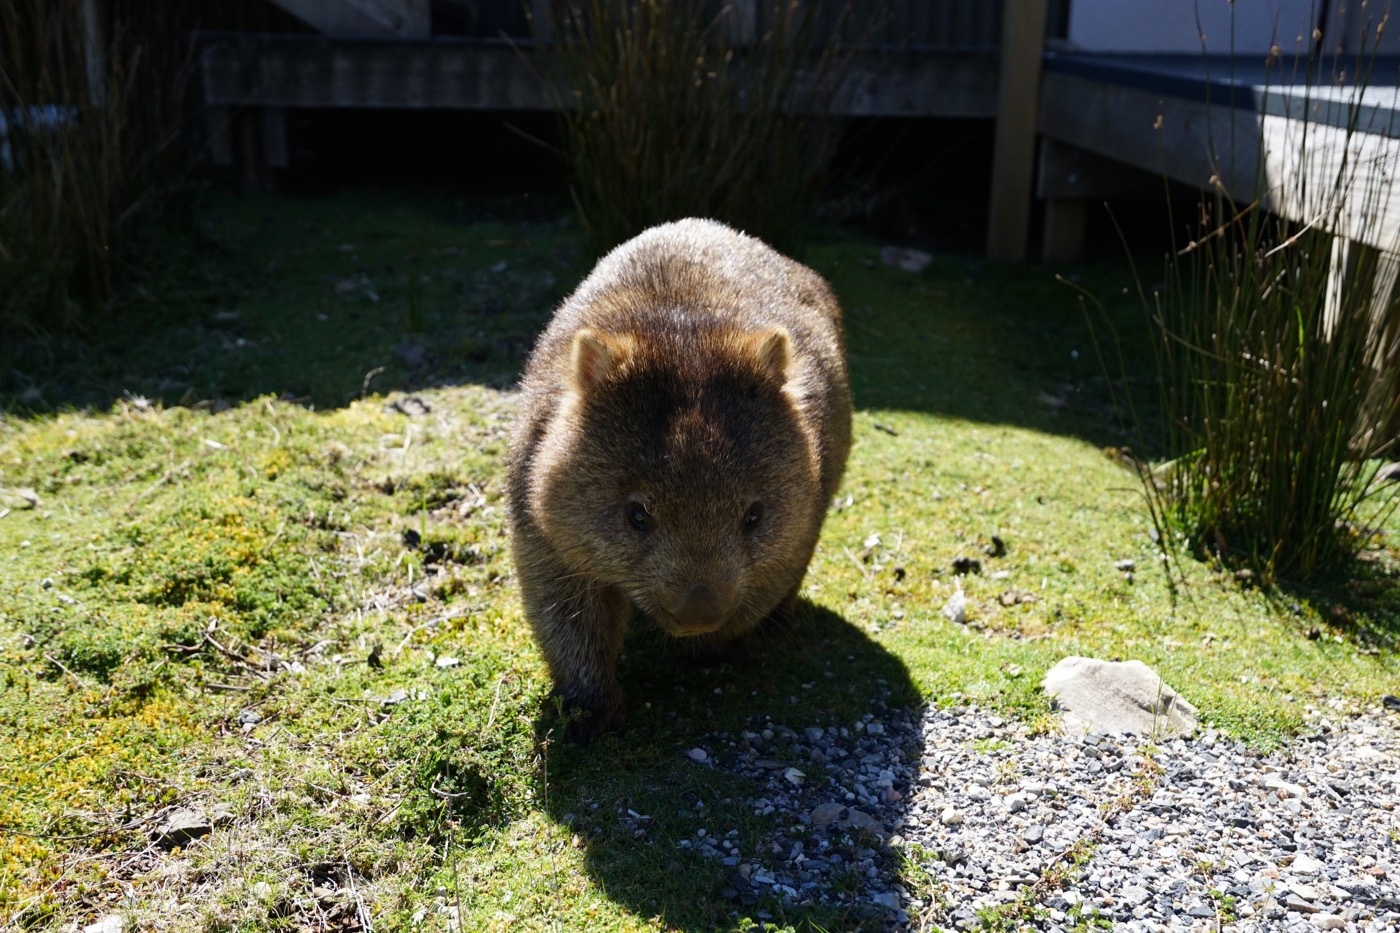 Wombat approaching